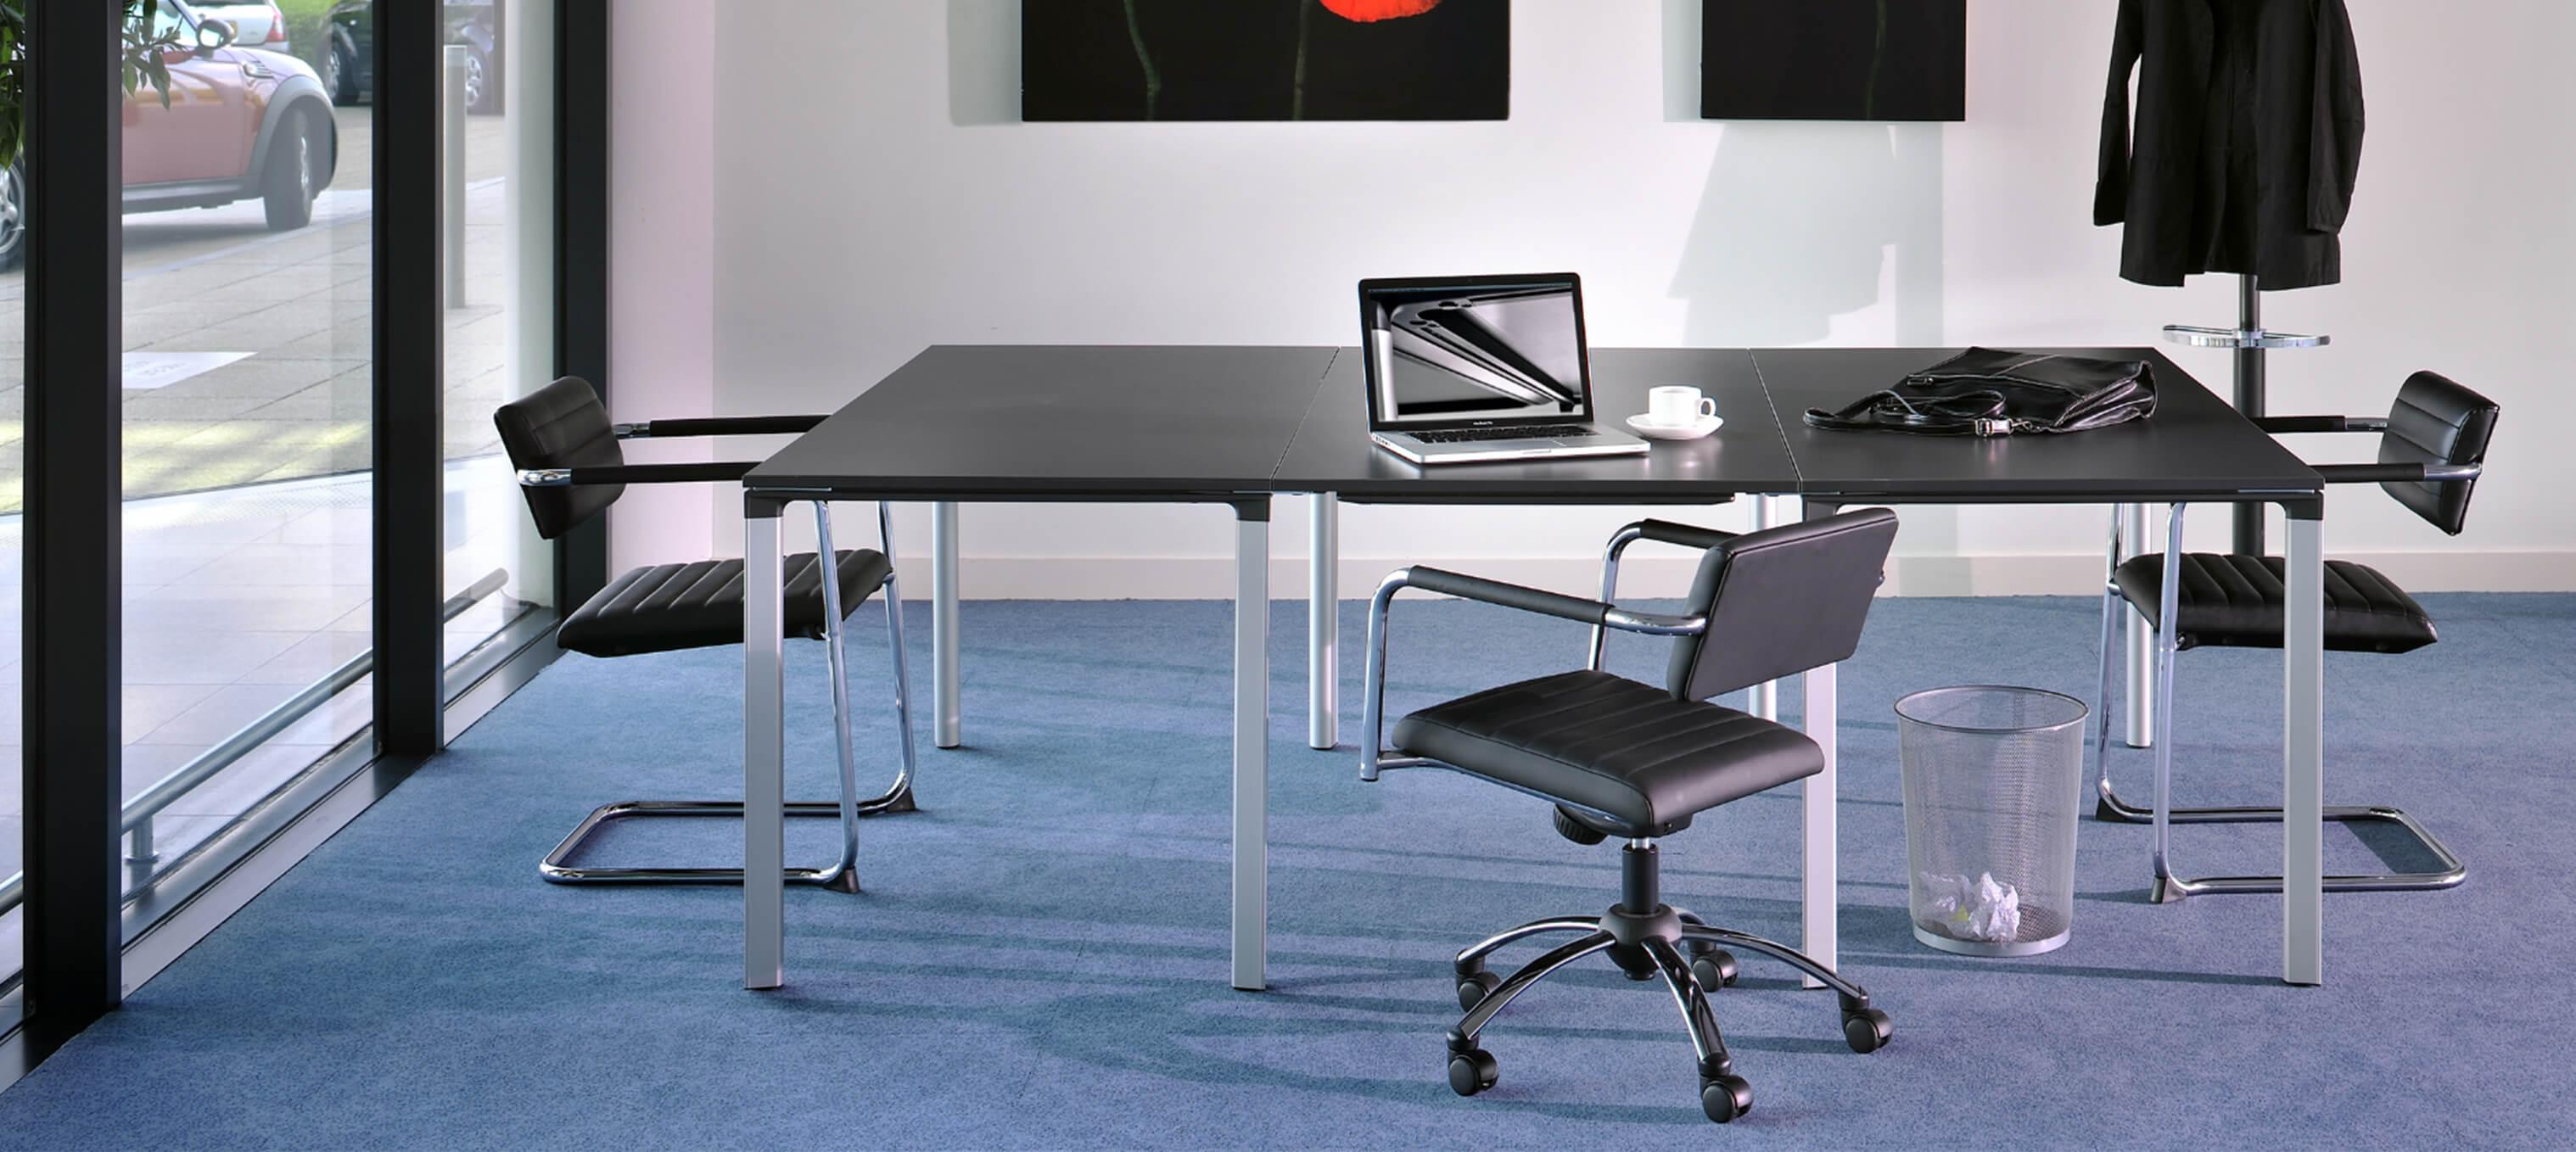 Tiani Meet-U Office